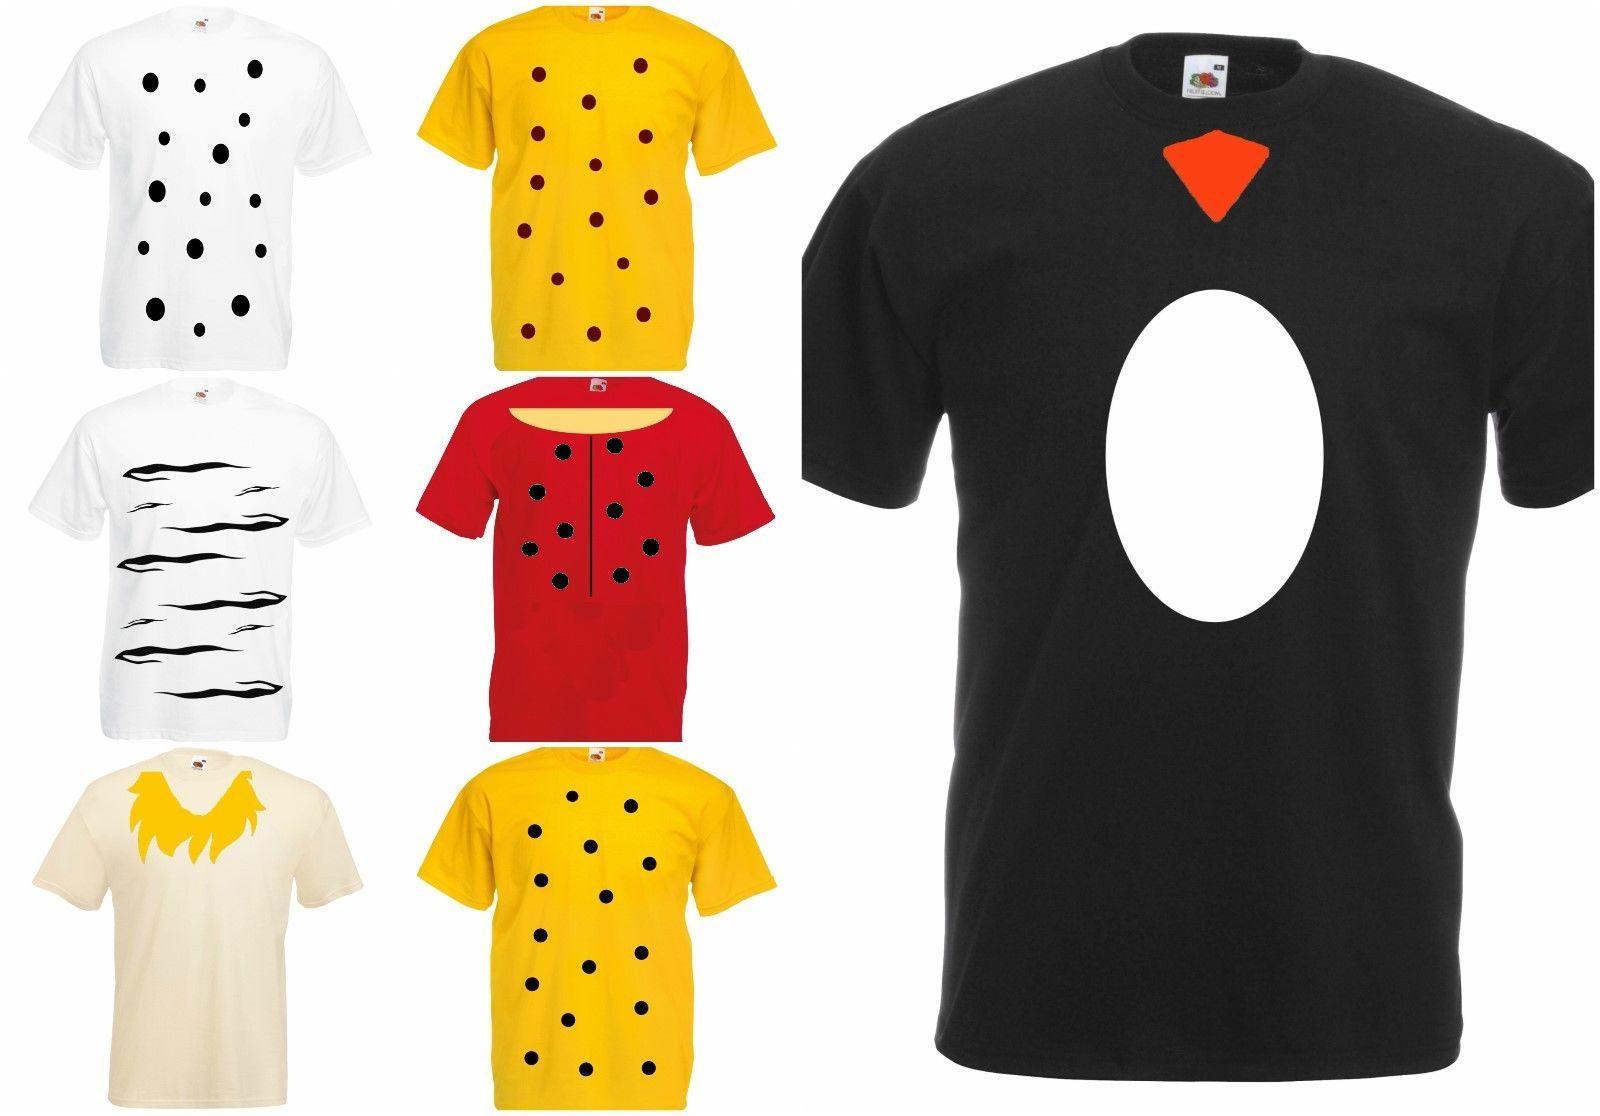 d8e57620 New Womens Mens Kids Dress Up Animal Dog Lion Giraffe Penguin T Shirt Age  Casual Pride T Shirt Men Unisex New Fashion Tshirt Designer White T Shirt  Printed ...